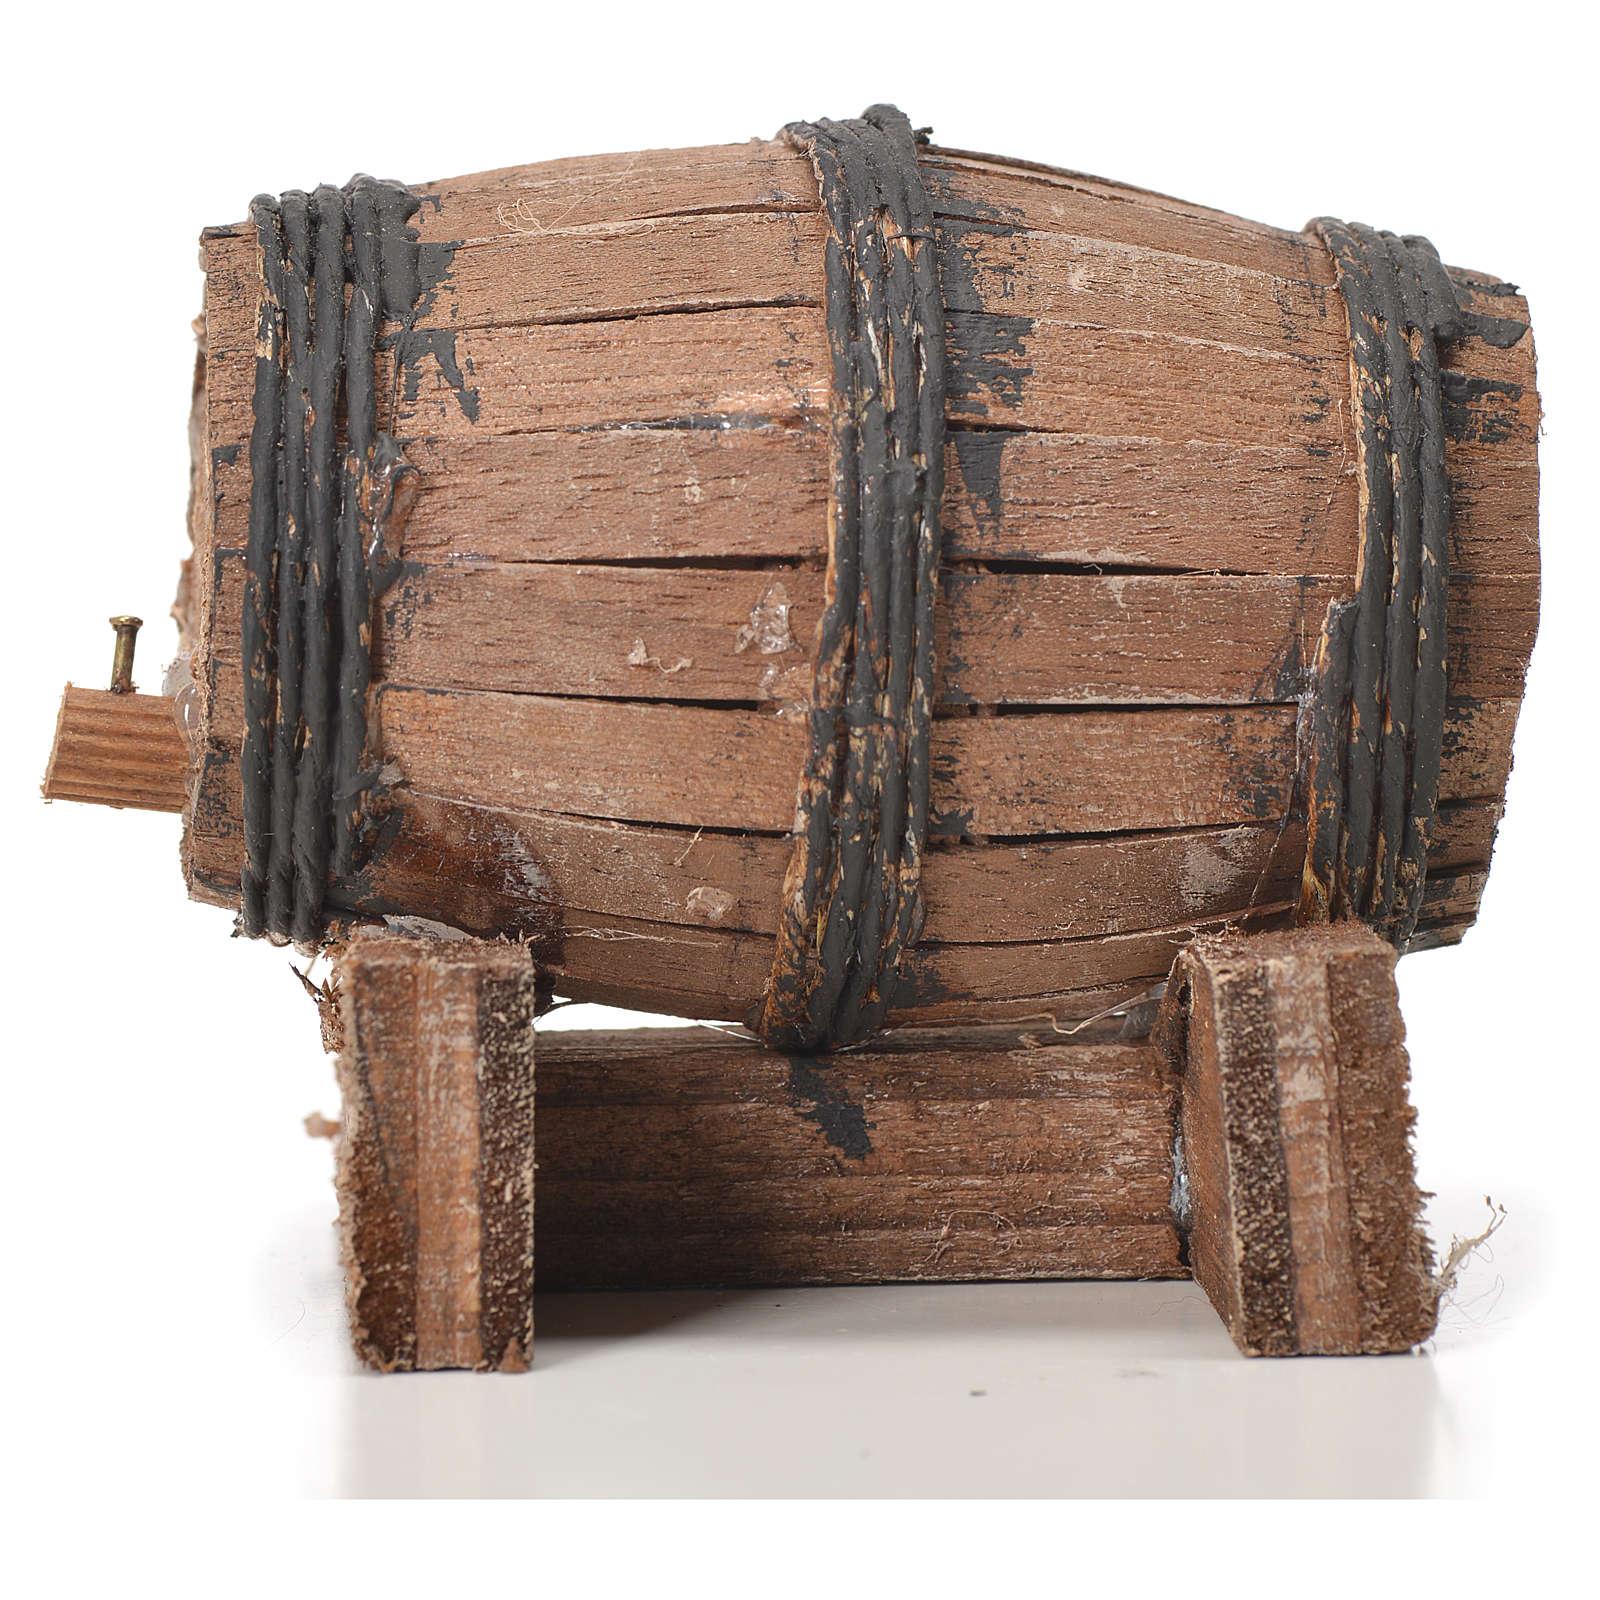 Botte legno 7,5 cm presepe Napoli 4